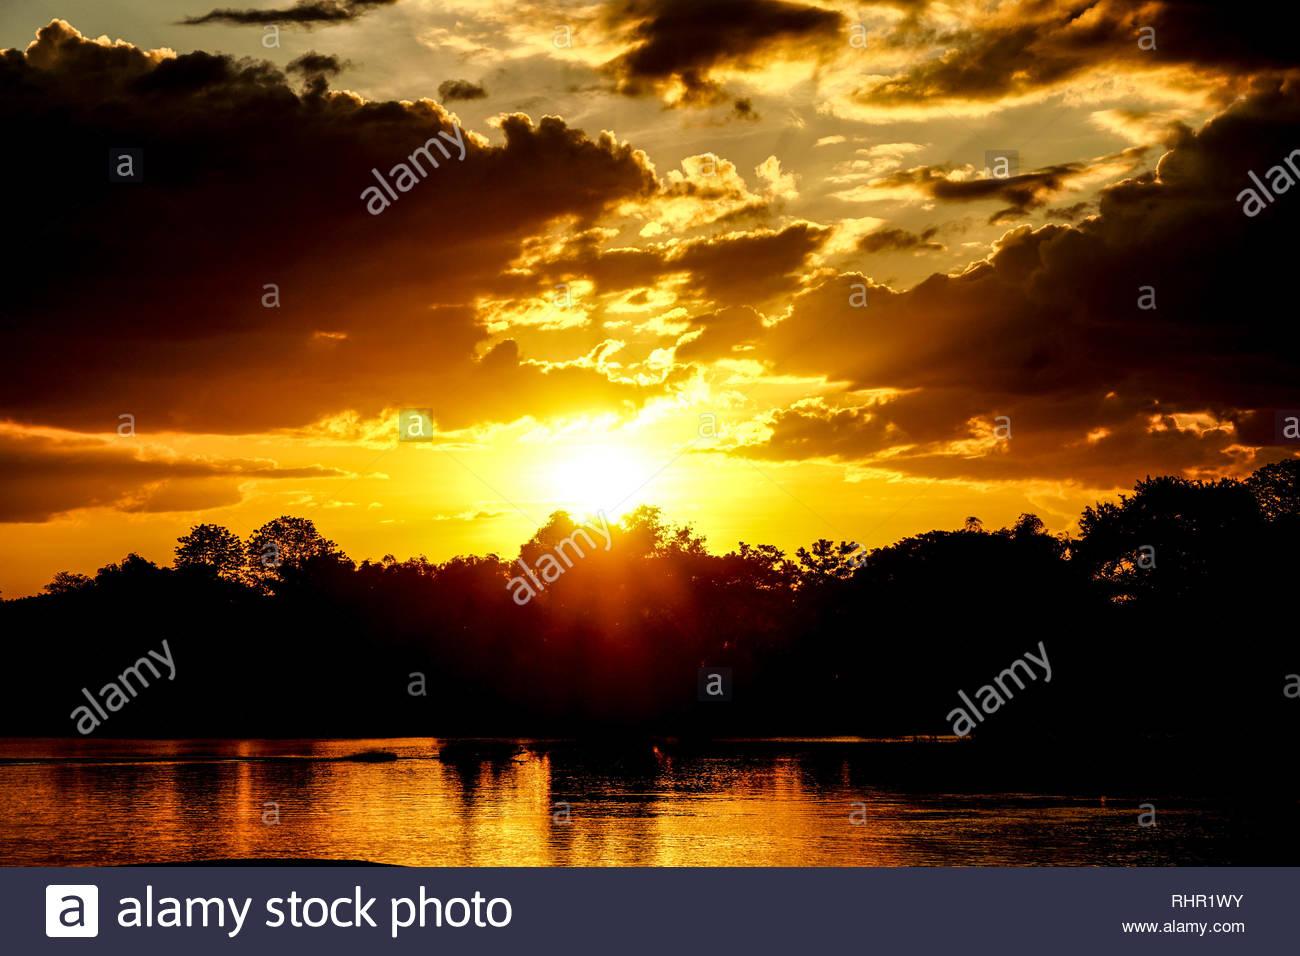 Beautiful Sunset on Dondet, Laos - Stock Image